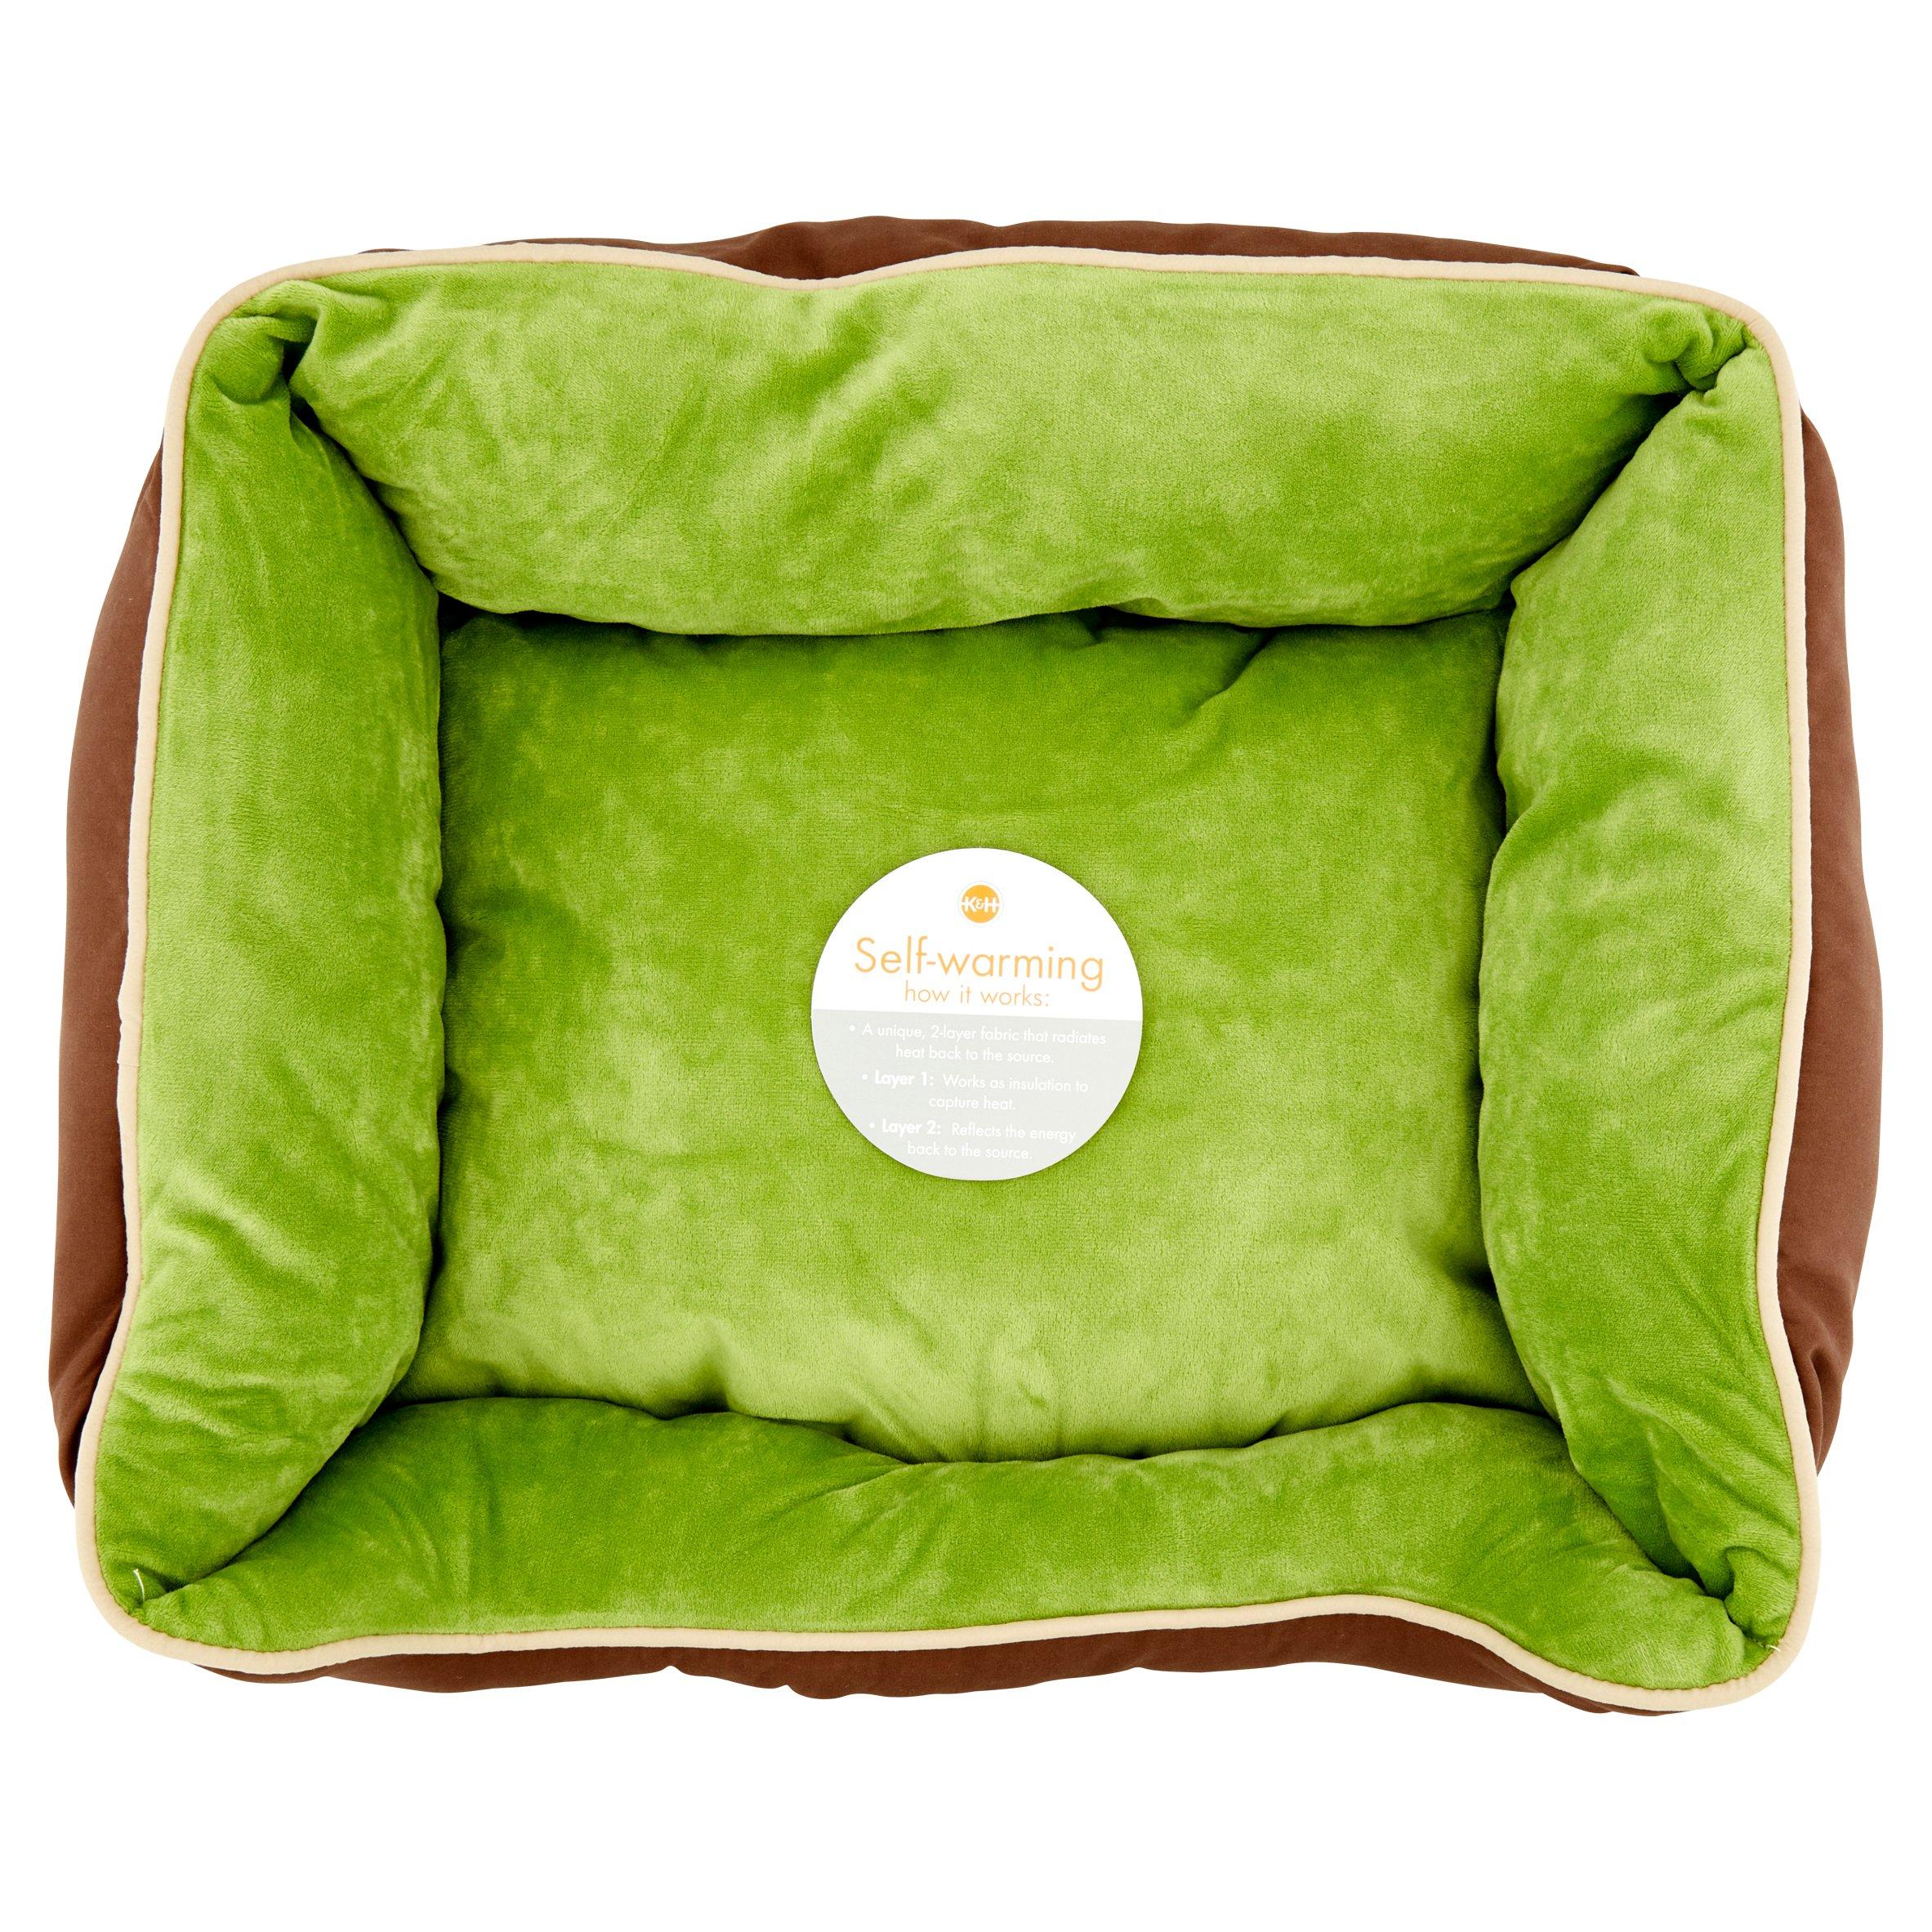 "K&H 16""x20"" Mocha/Green Self-Warming Lounge Sleeper"